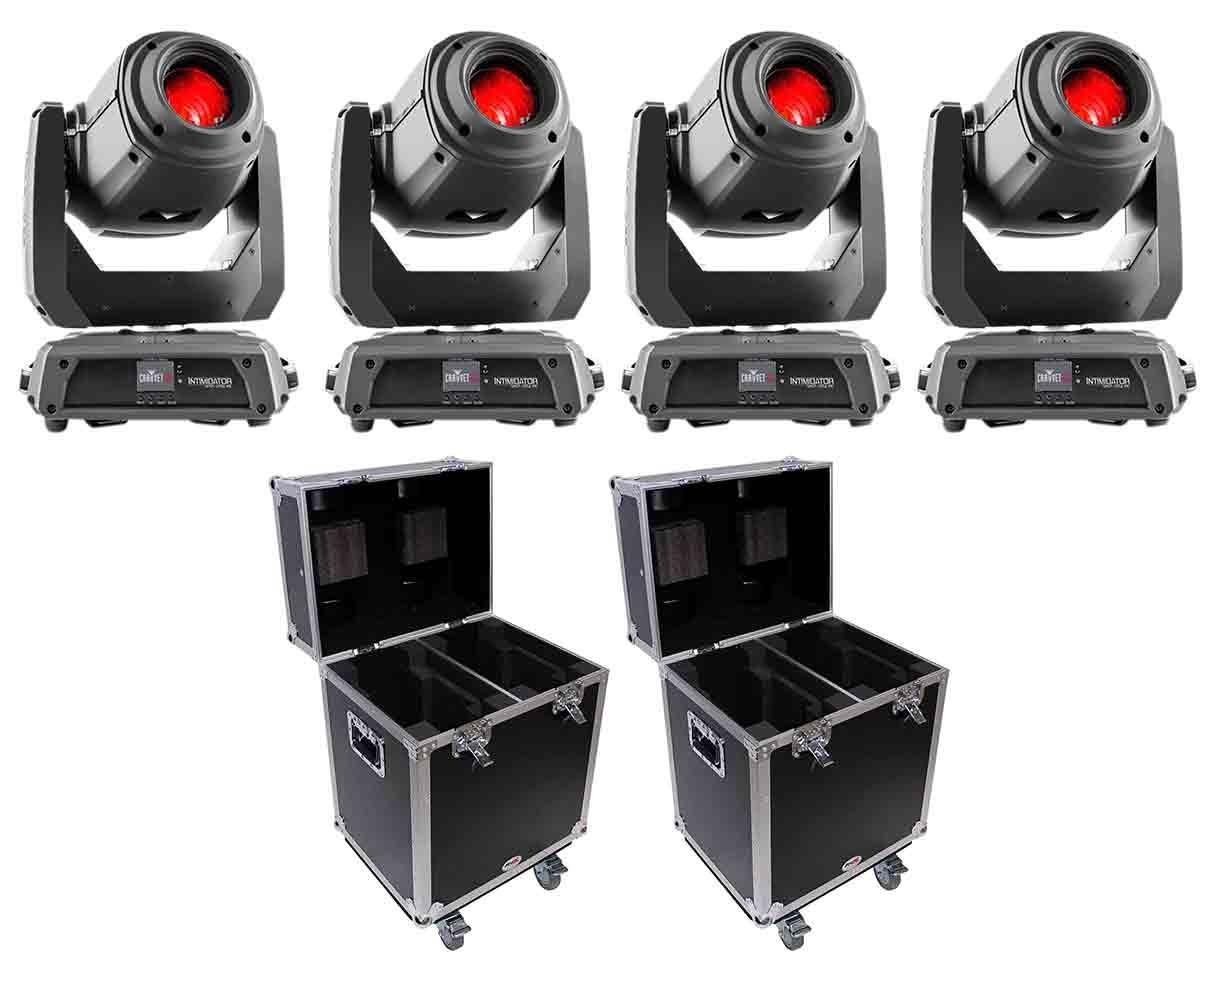 4x CHAUVET DJ Intimidator Spot 375Z IRC + Flight Cases